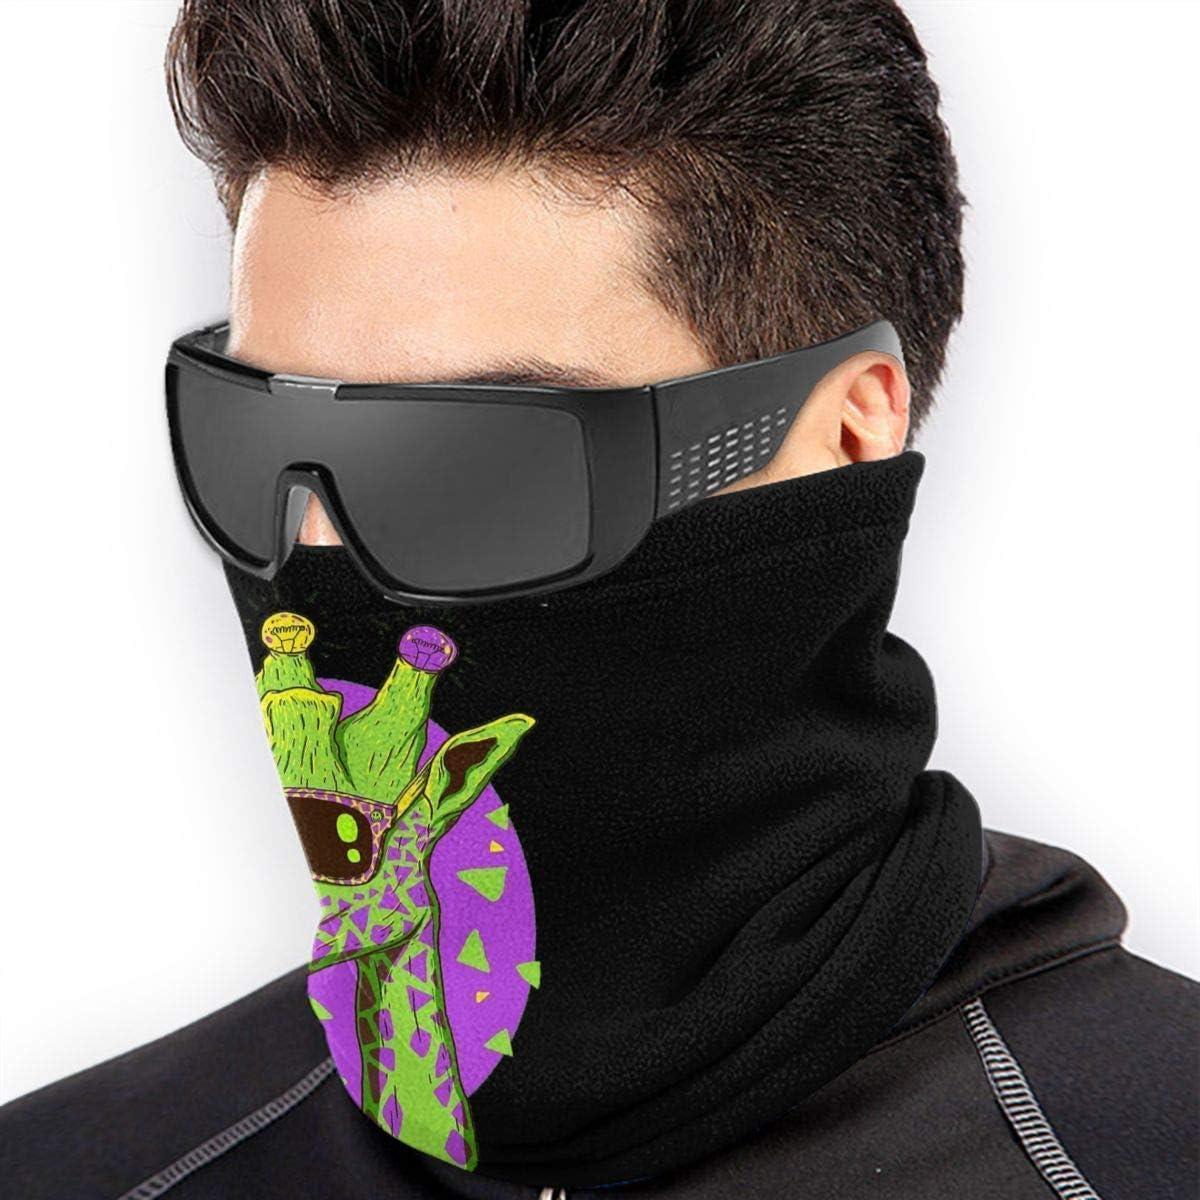 Funny Giraffeo Microfiber Neck Warmer Balaclavas Soft Fleece Headwear Face Scarf Mask For Winter